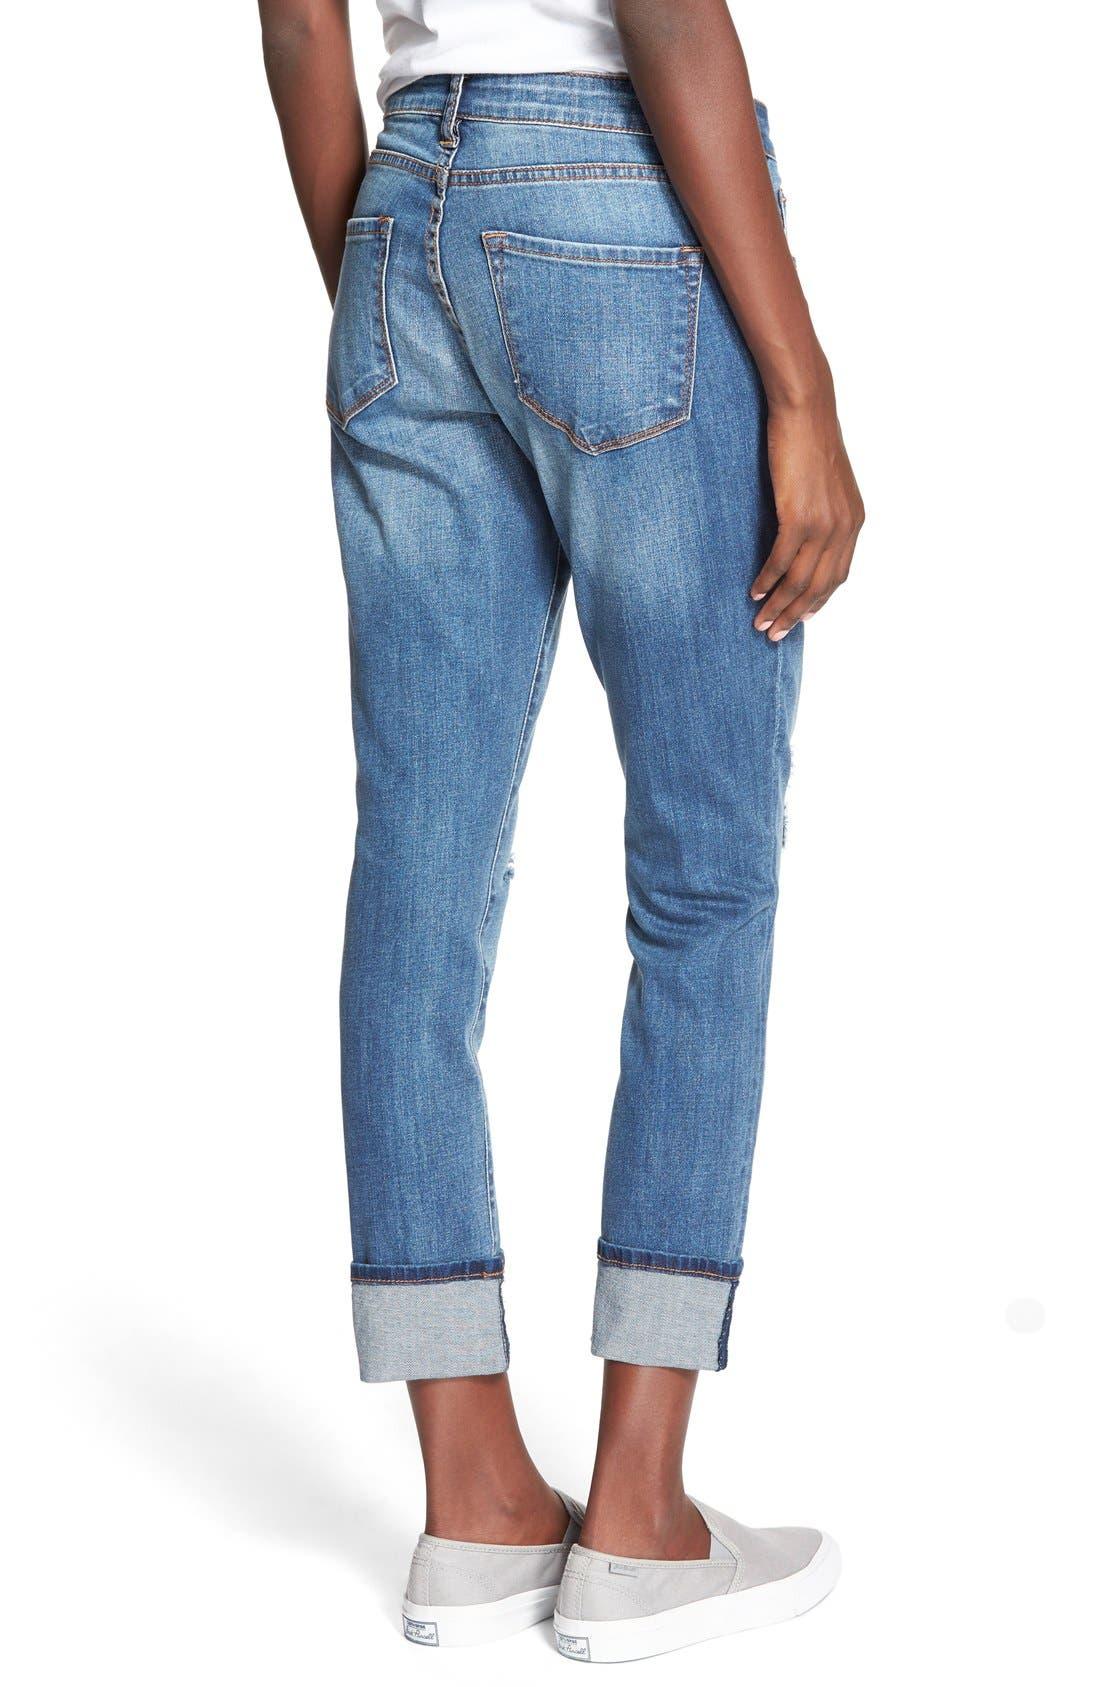 Alternate Image 3  - STS Blue 'Tomboy' High Rise Boyfriend Jeans (Pismo Beach)